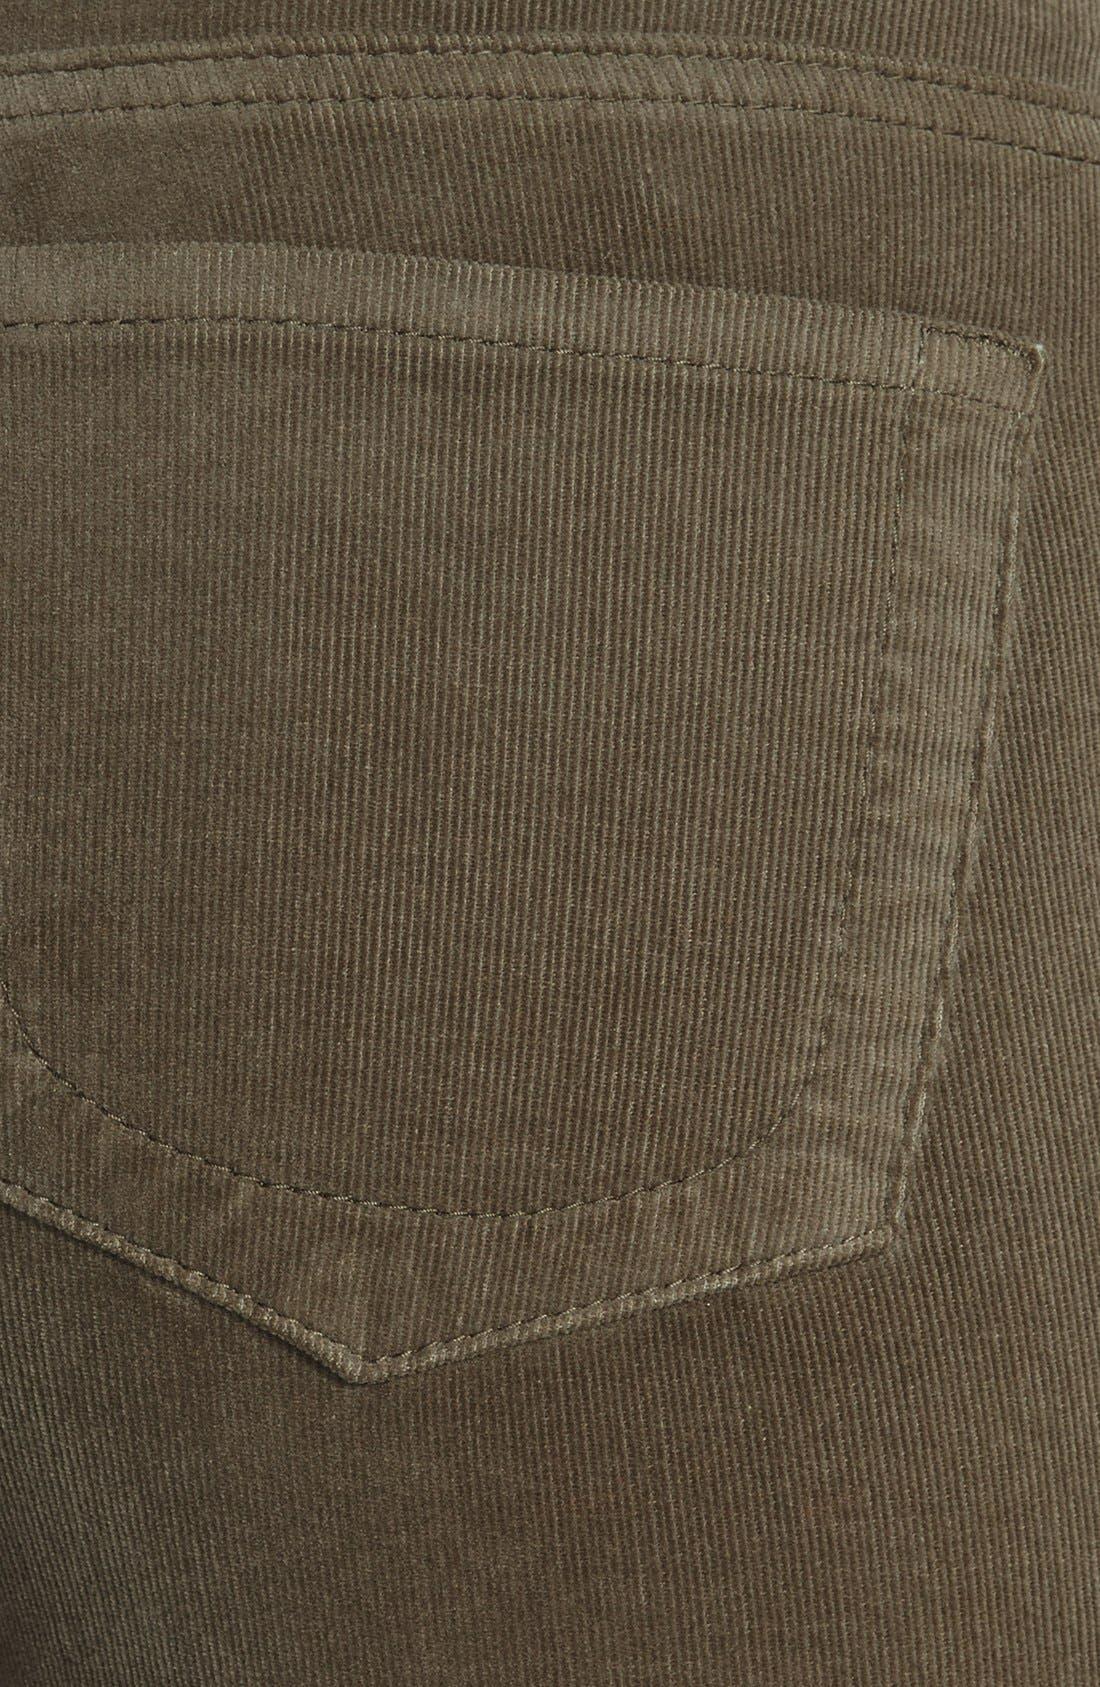 'Diana' Stretch Corduroy Skinny Pants,                             Alternate thumbnail 166, color,